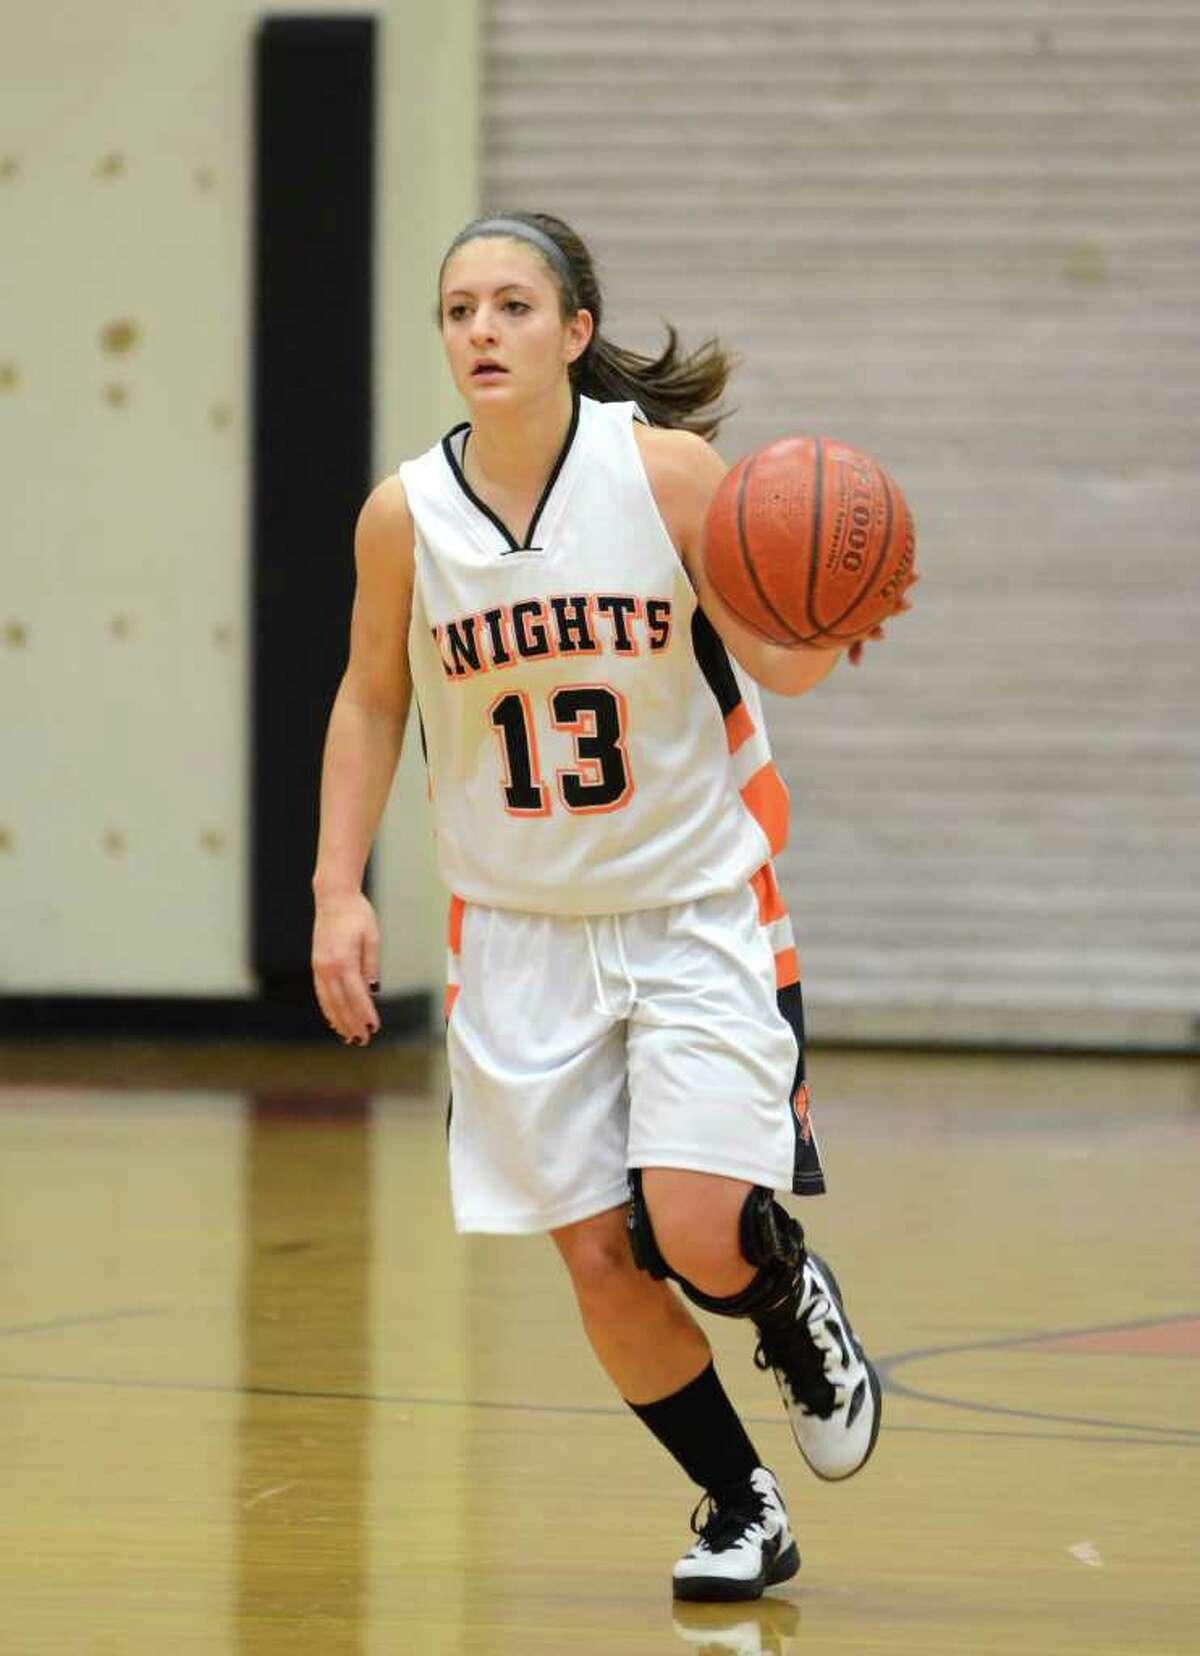 Stamford's Kelsey Cognetta (13) dribbles the ball during the season opener girls basketball game against Bassick at Stamford High School on Wednesday, Dec. 7, 2011.